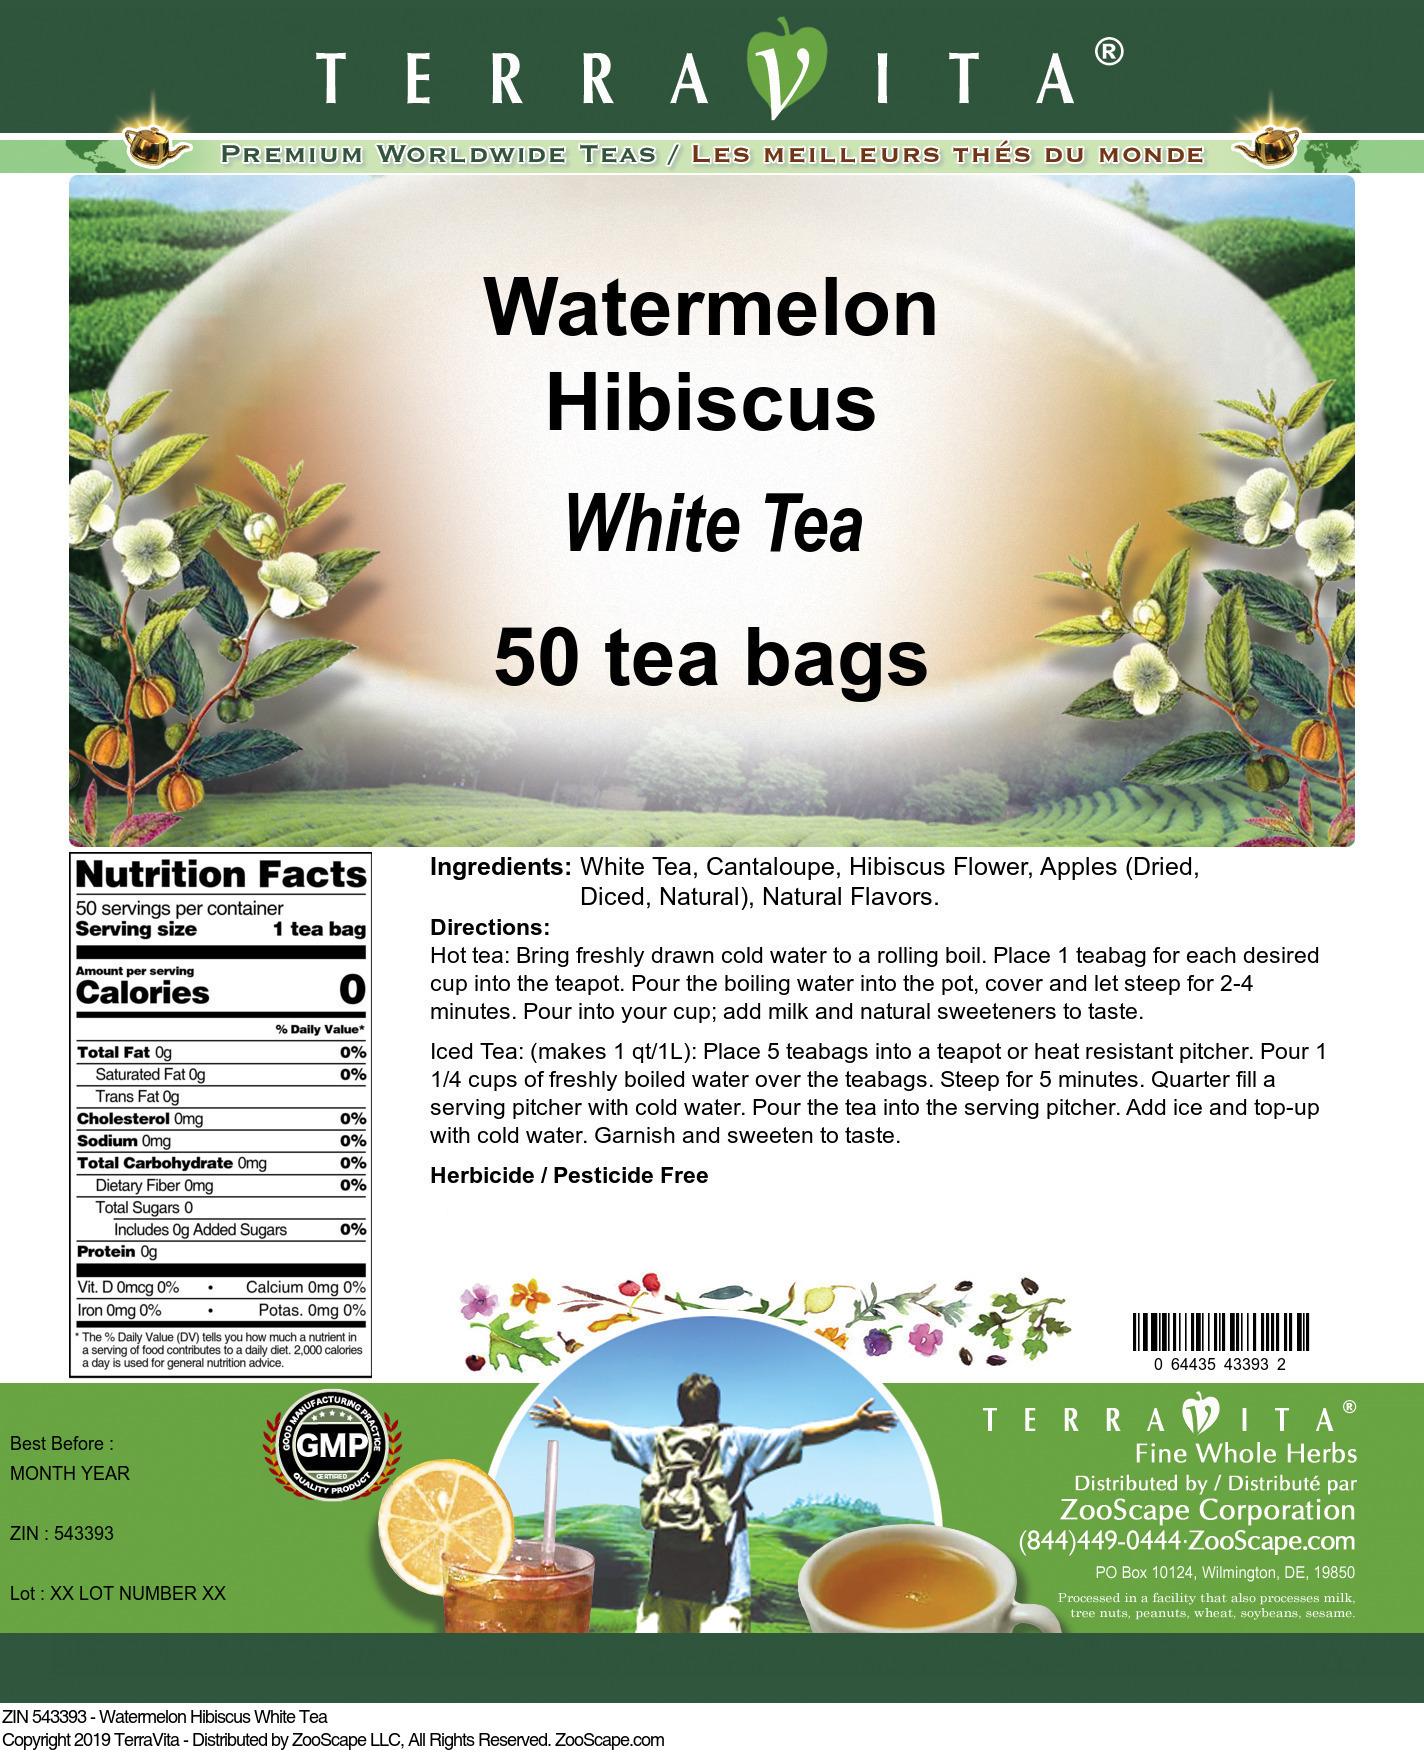 Watermelon Hibiscus White Tea